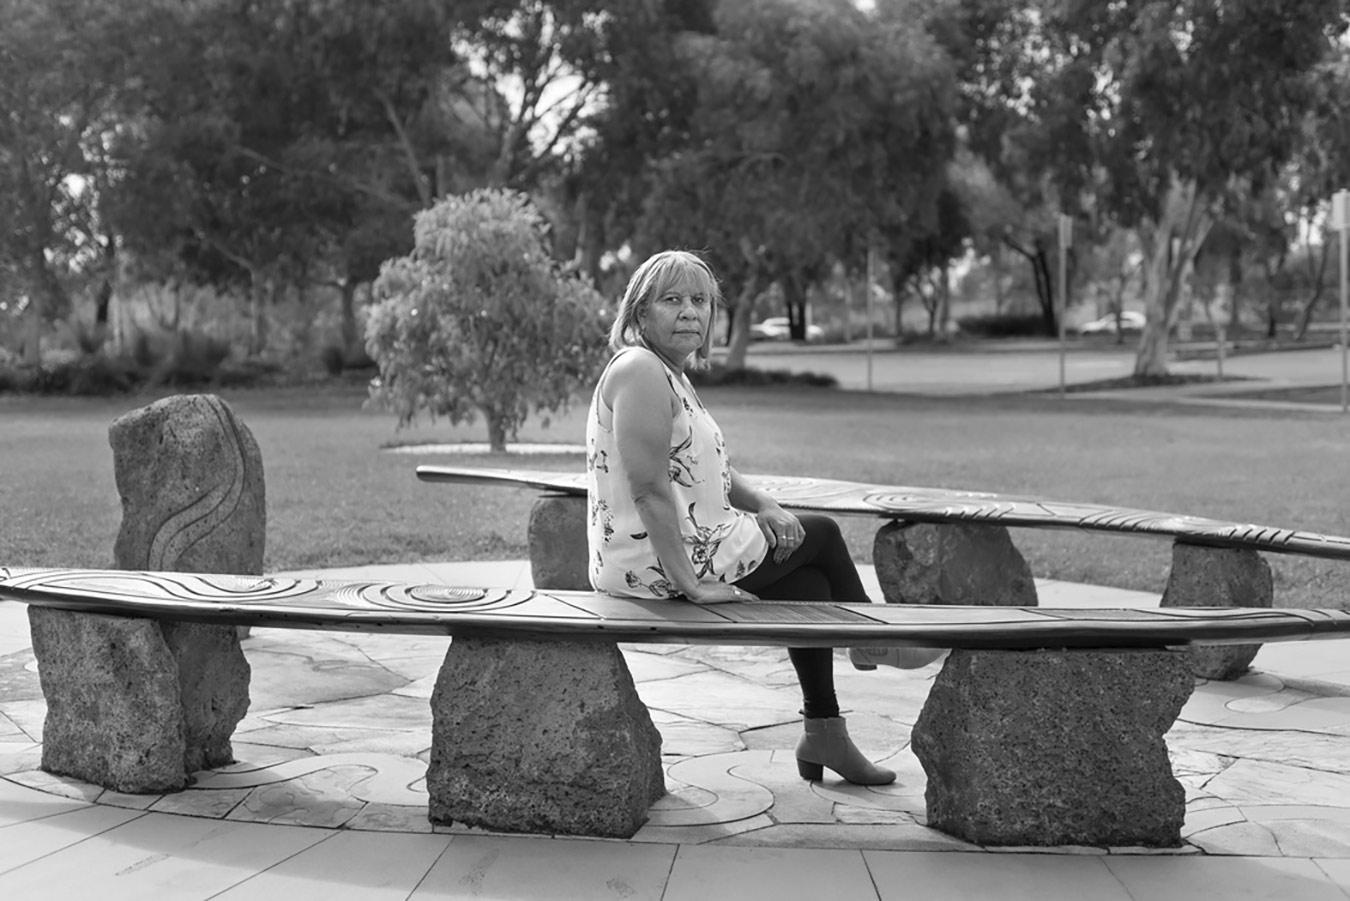 Eav Jo Edwards from the series Yumarrala Ngulu by Devika Bilimoria (with Ondru)